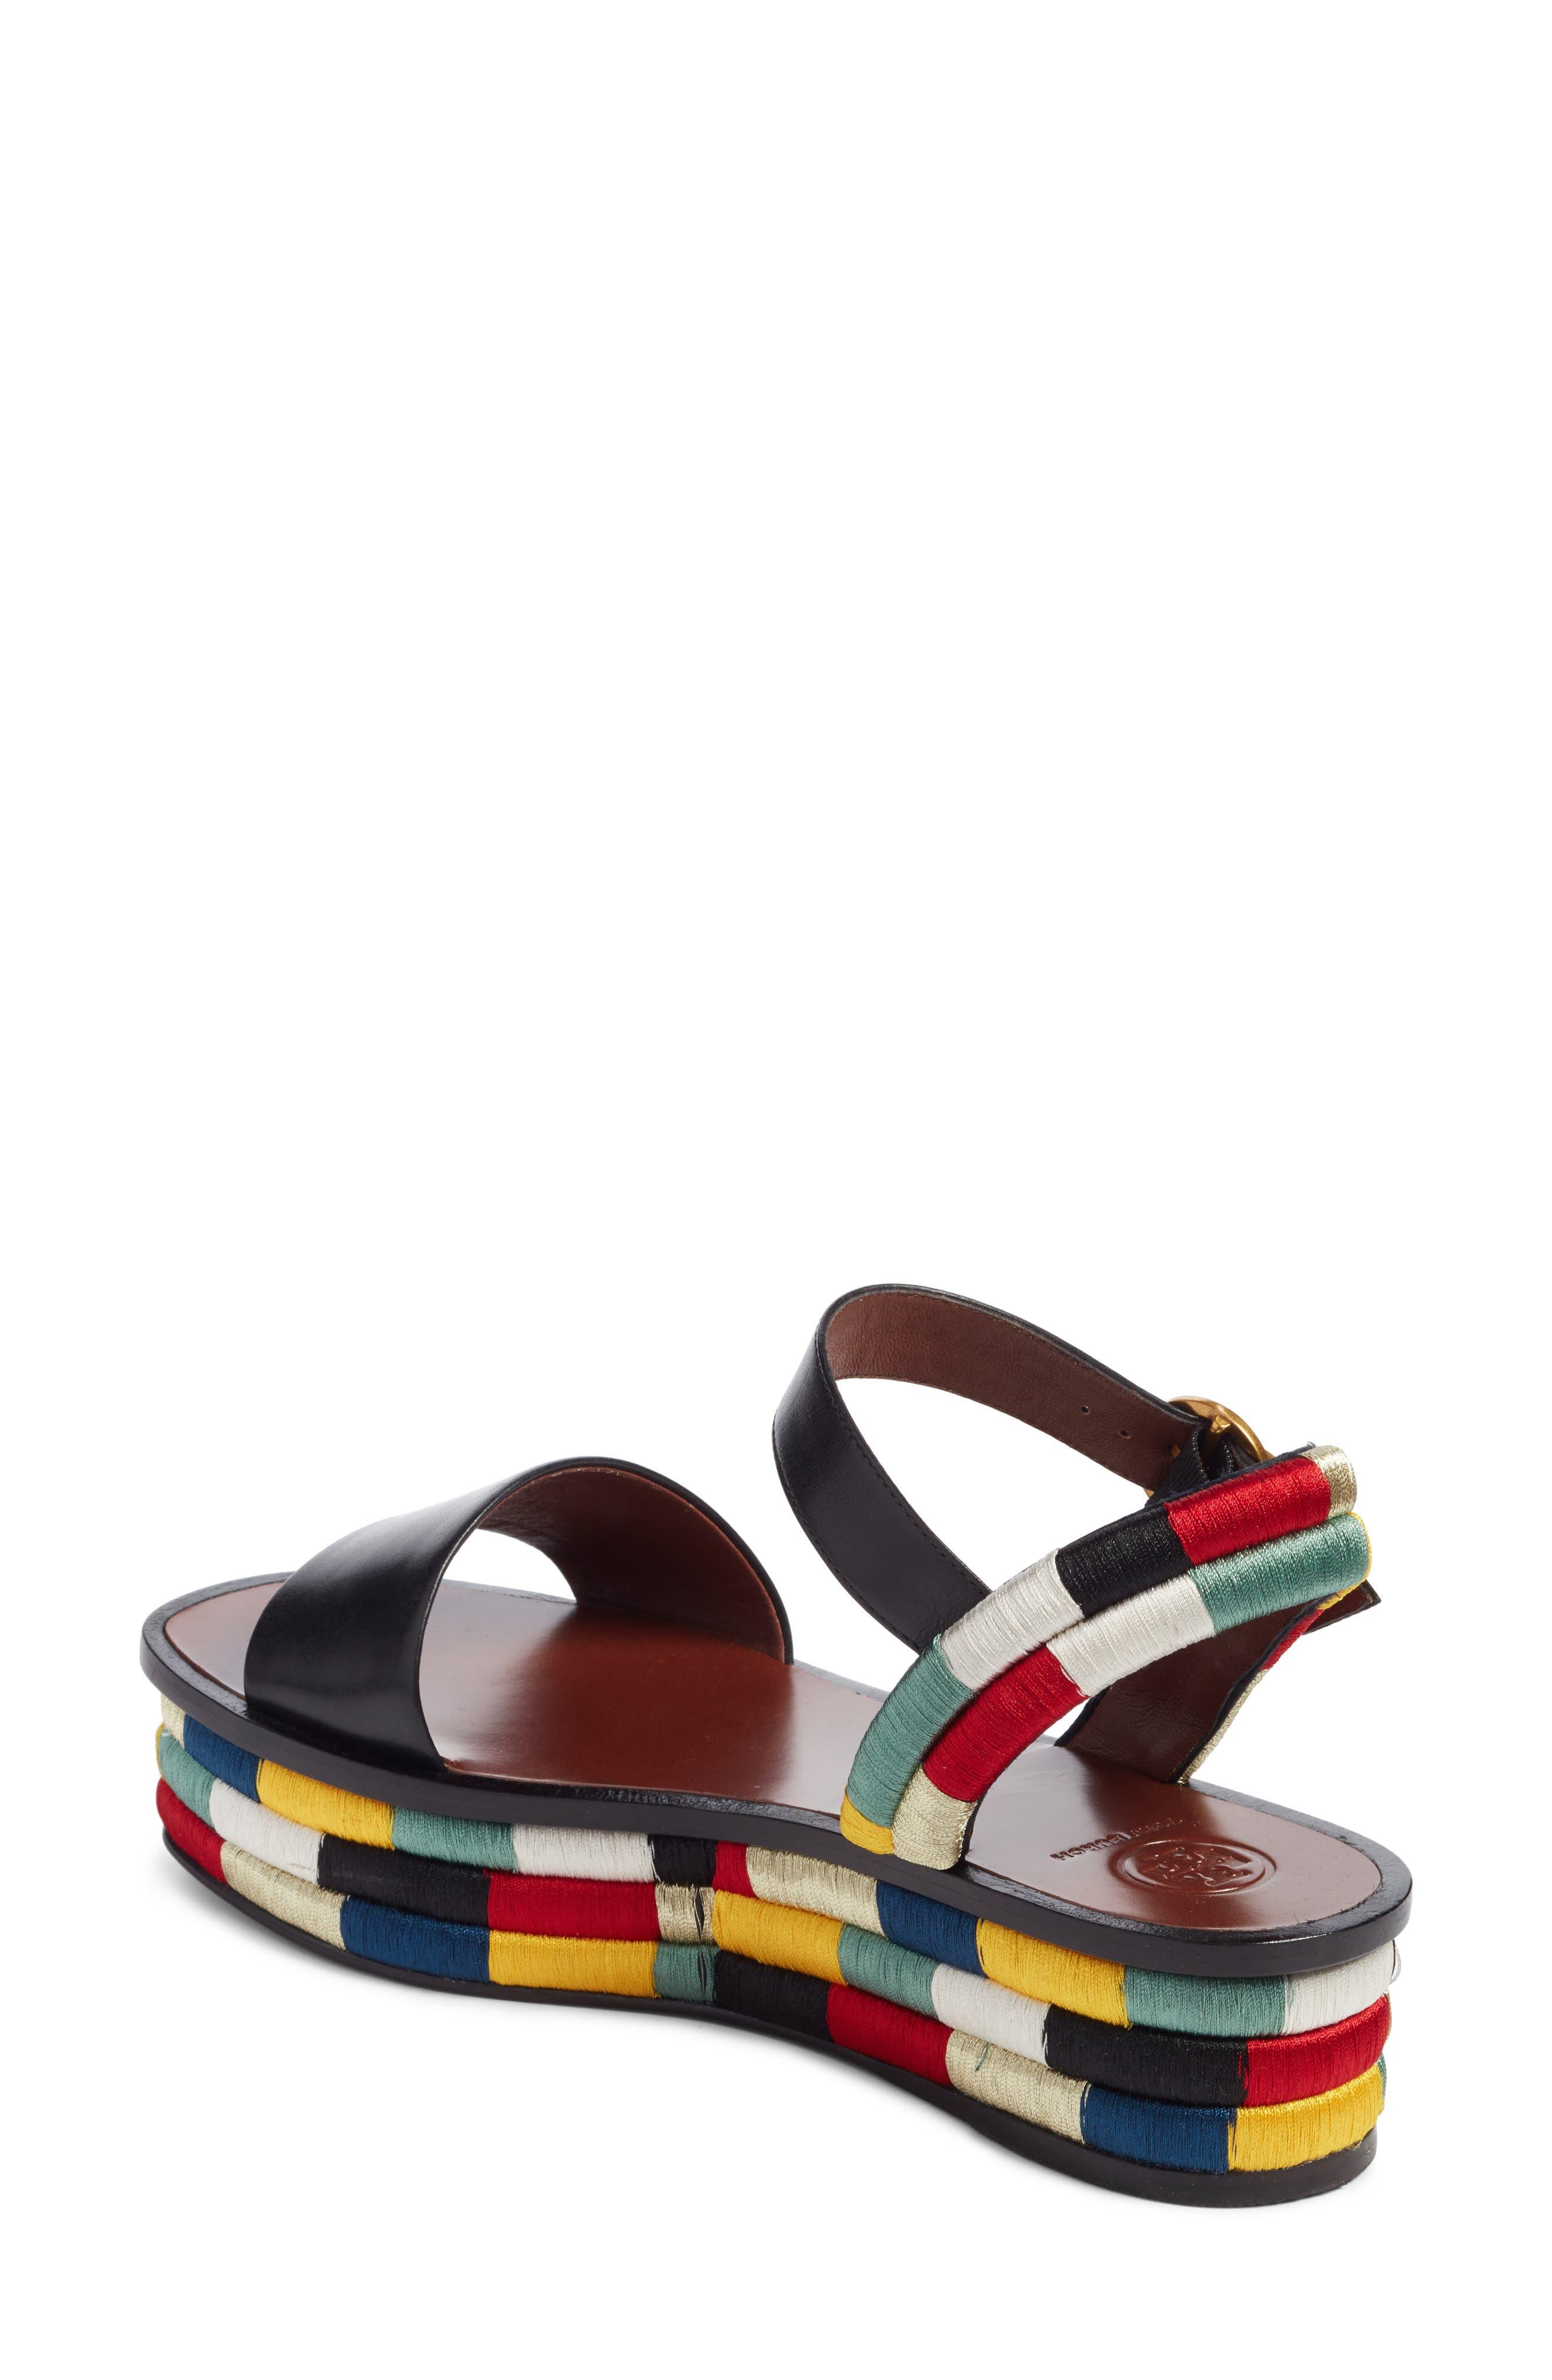 Camilla Platform Sandal,                             Alternate thumbnail 3, color,                             Black